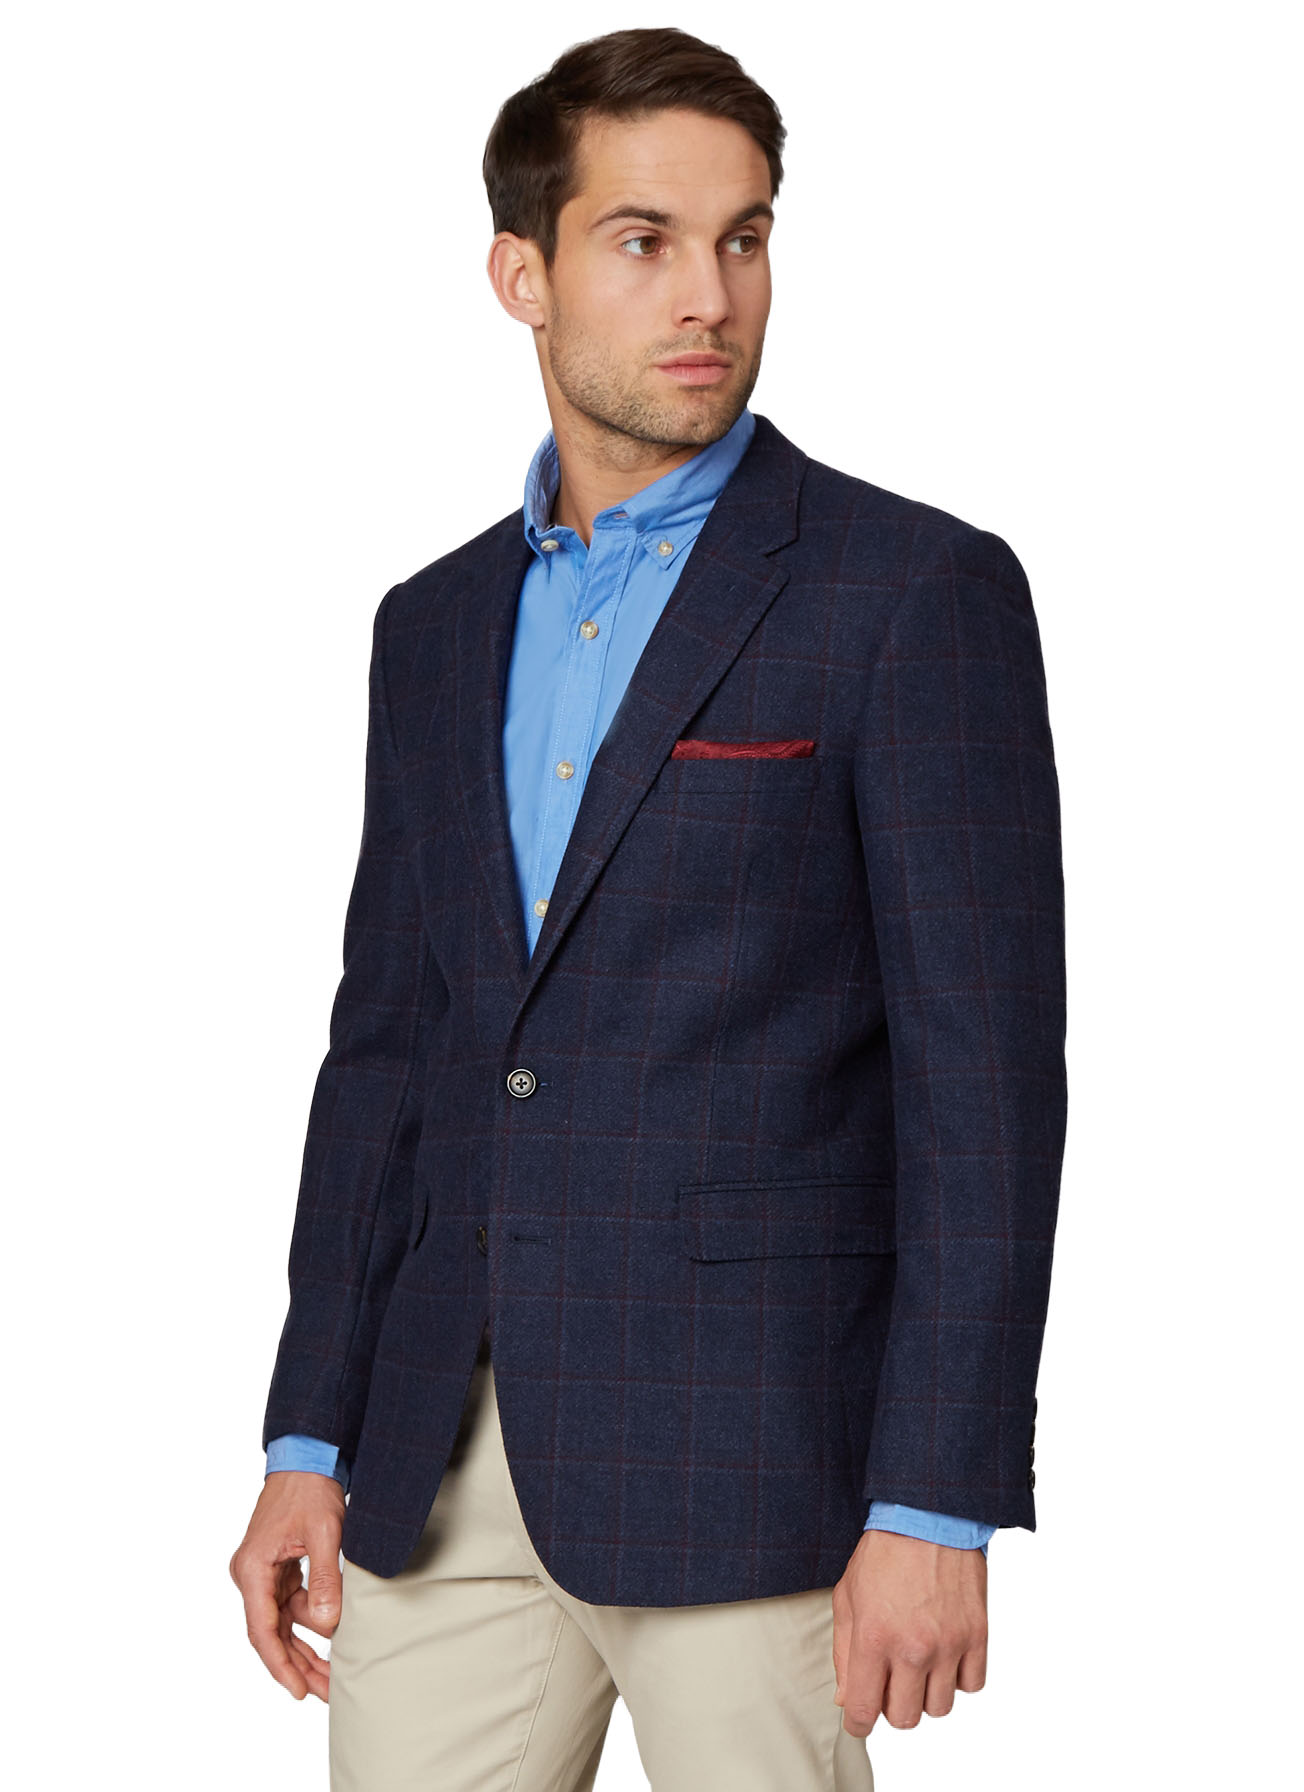 Ermenegildo Zegna Cloth Men Check Navy Suit Jacket Regular Fit Windowpane  Blazer a5ed50fa5e10